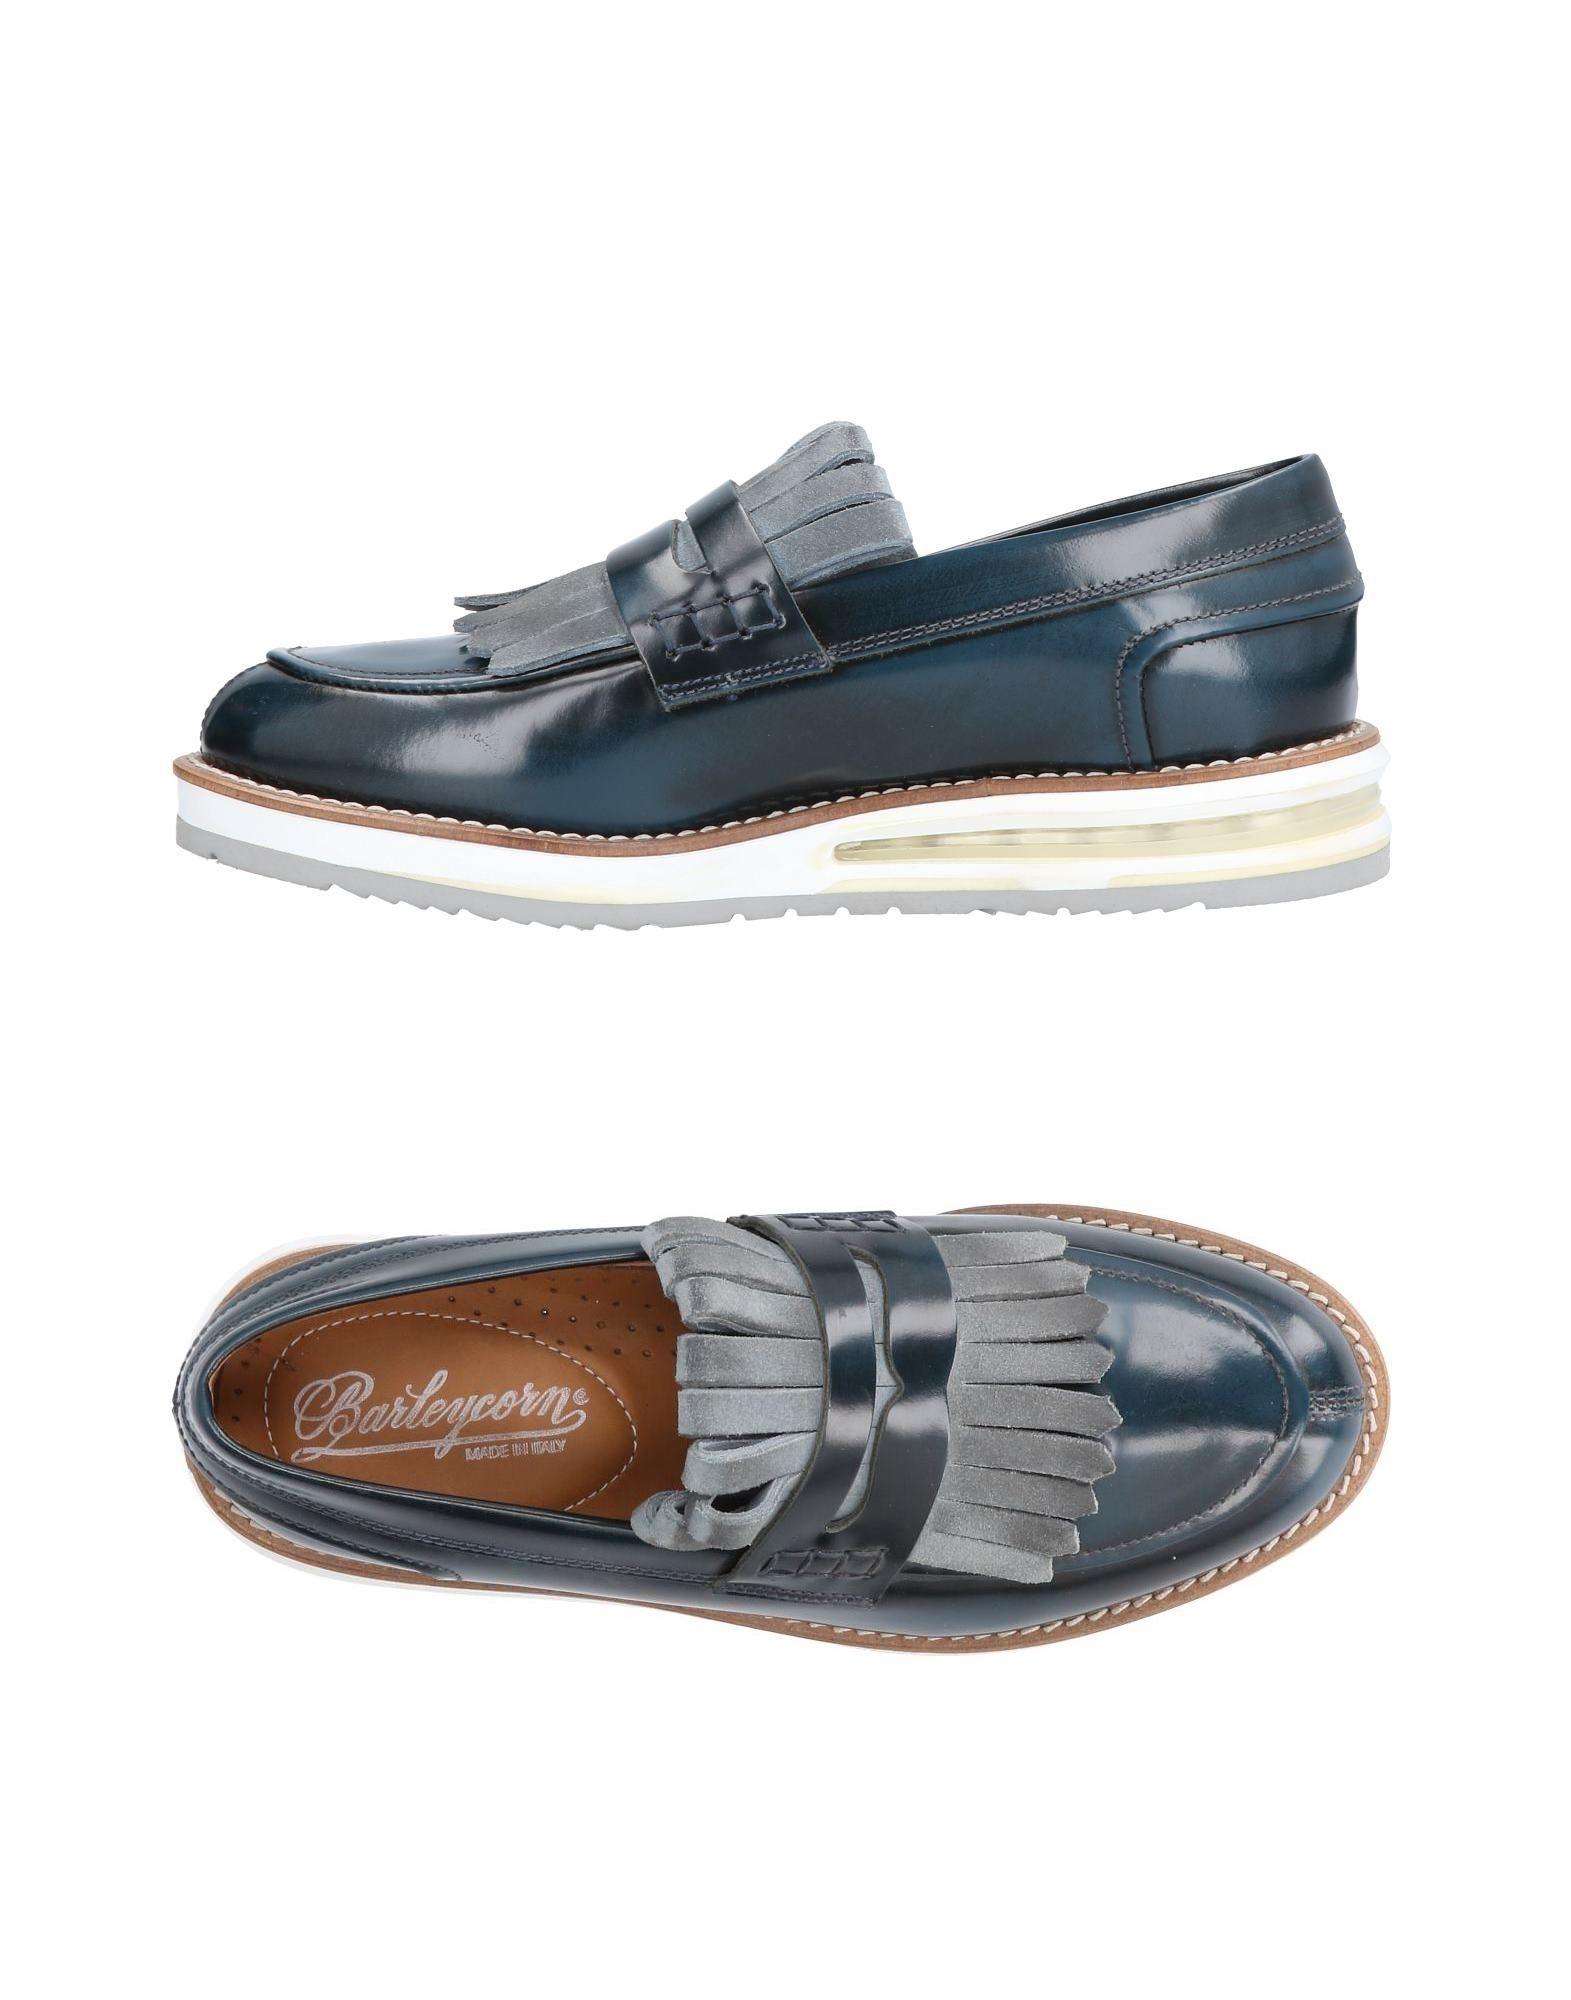 Barleycorn Mokassins Damen  11479243PM Gute Qualität beliebte Schuhe